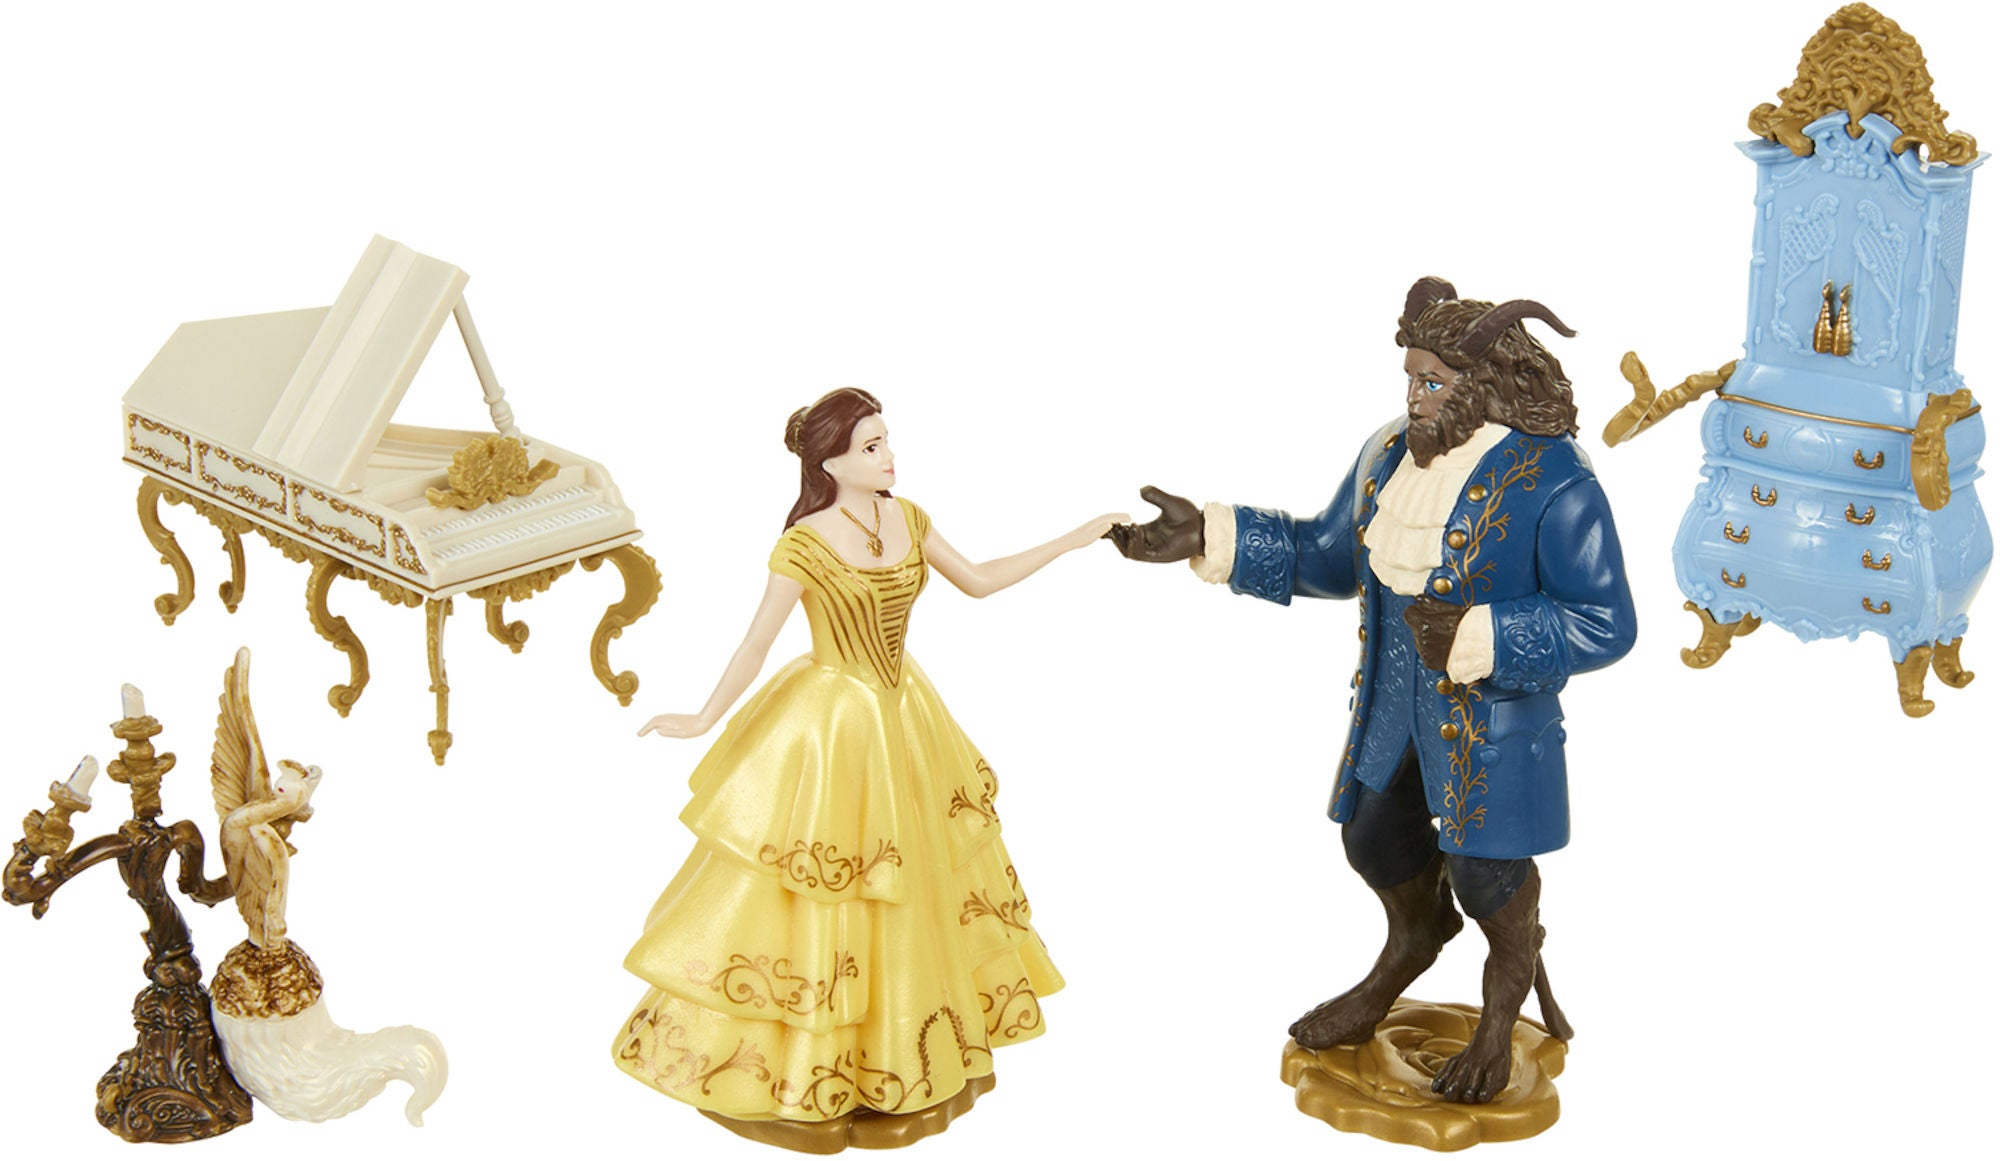 Disney Prinsessat Kaunotar ja Hirviö Figuurit